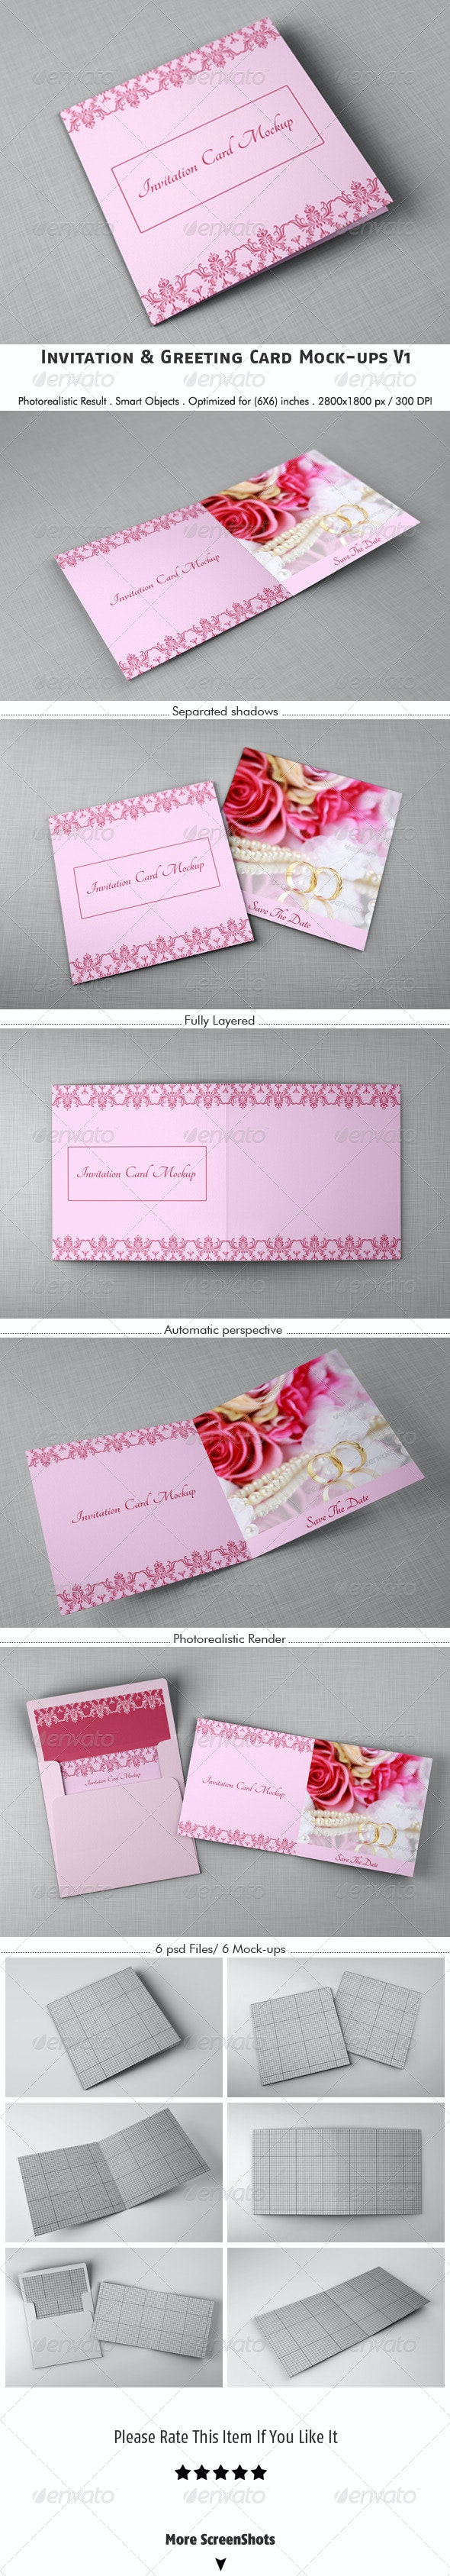 Invitation & Greeting Card Mockups V1 - Stationery Print